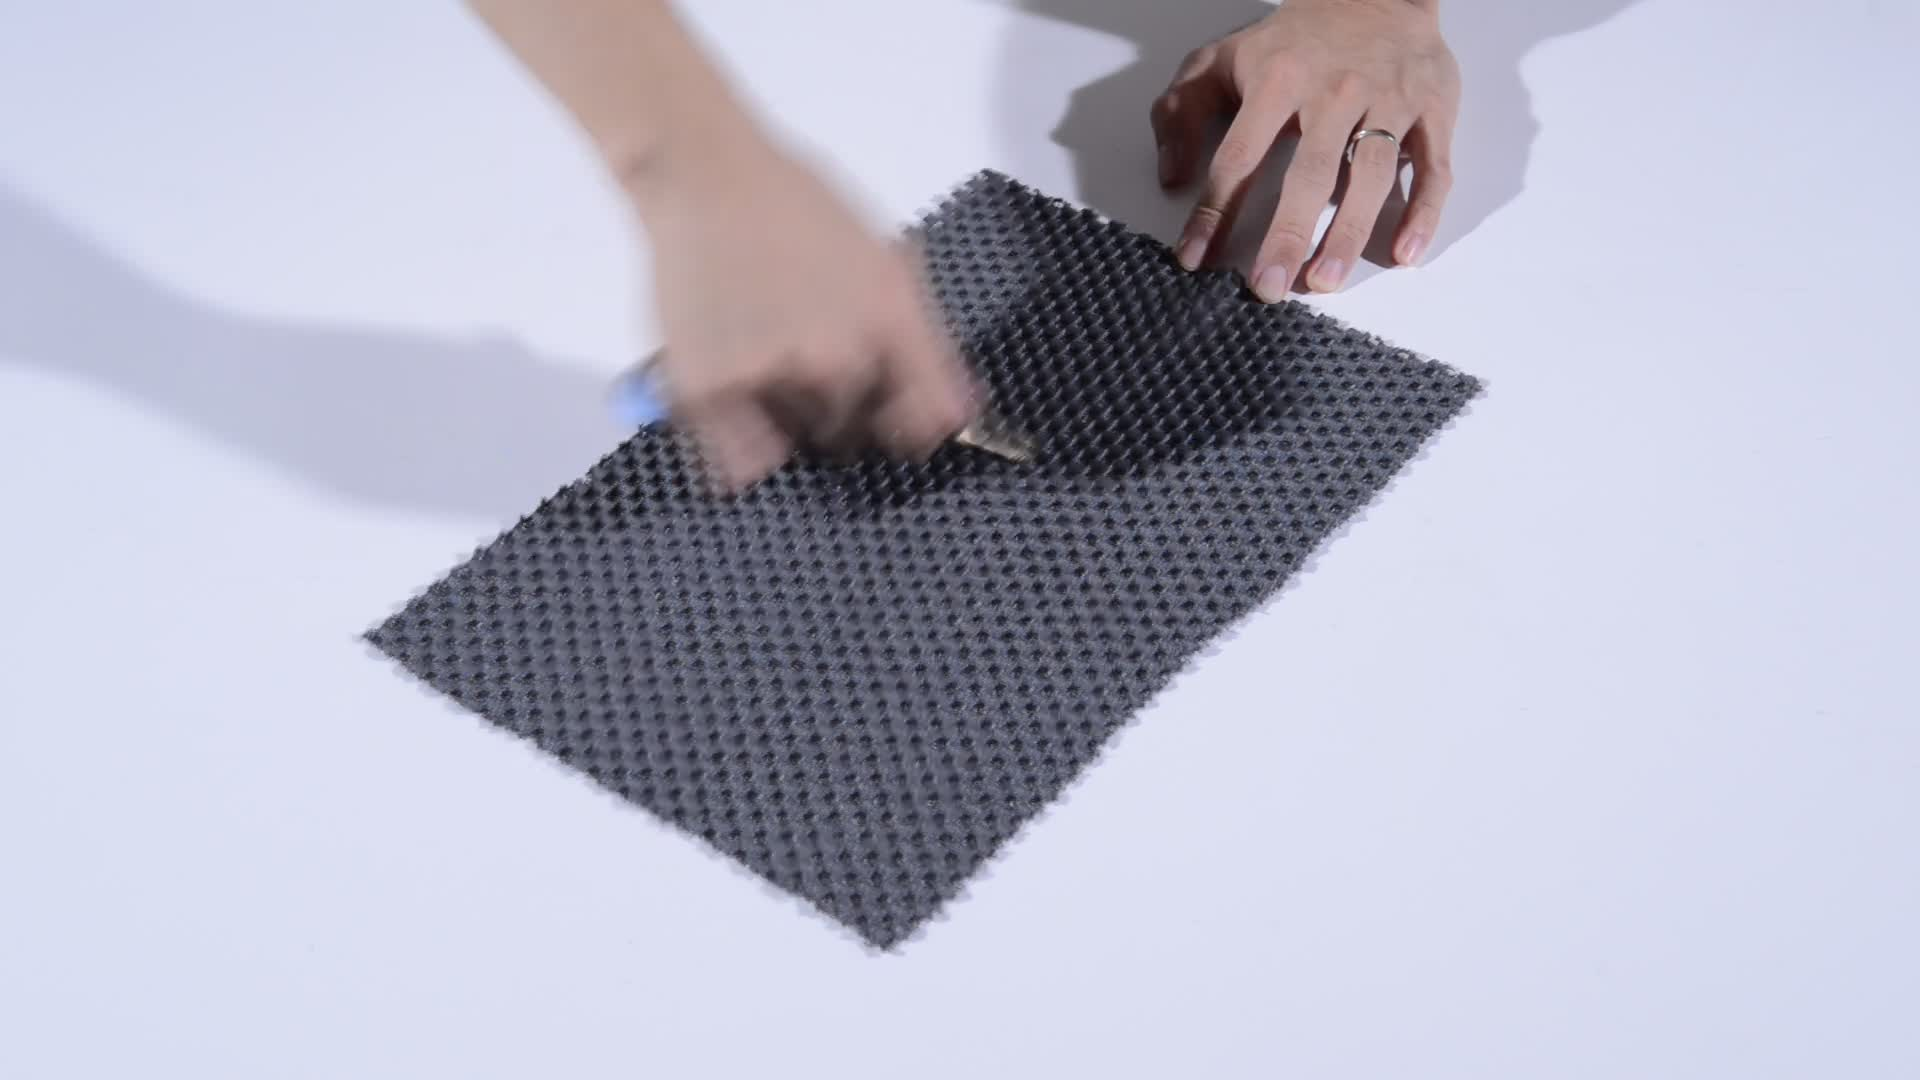 Classic Oem Unique Design Washable 3D Air Mesh Fabrics For Mattress Pad